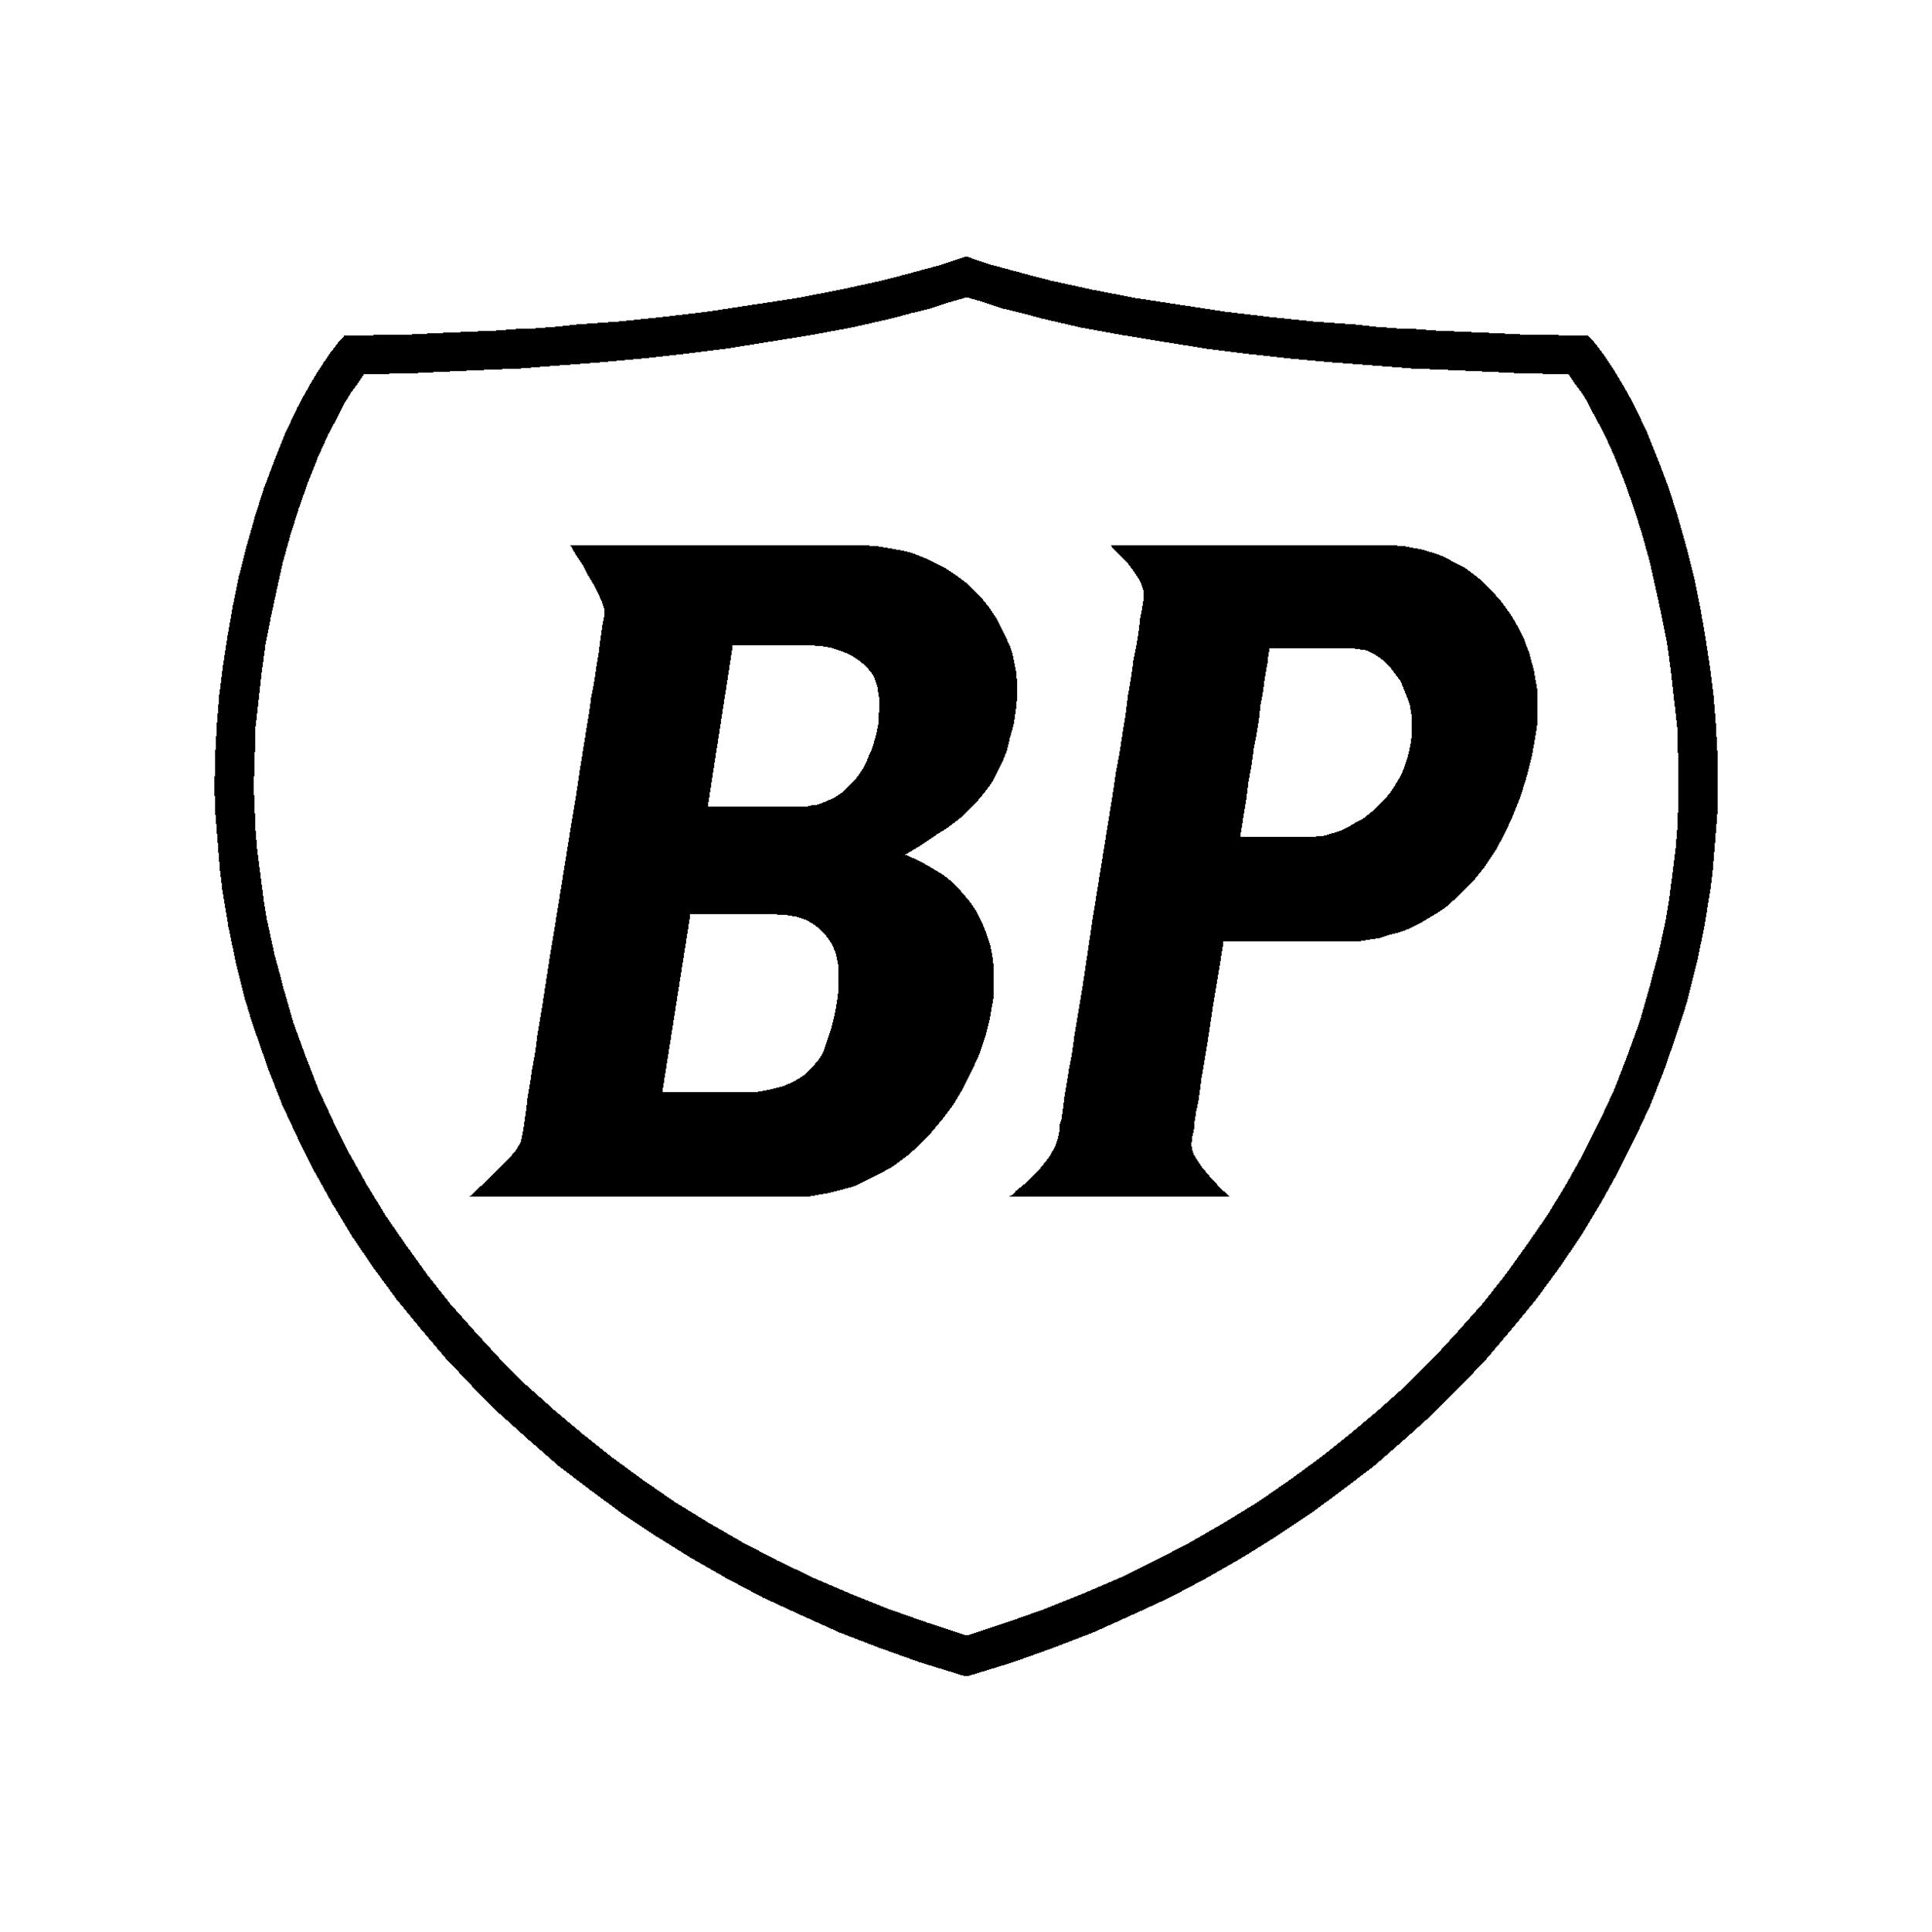 sticker bp ref 1 tuning auto moto camion competition deco rallye autocollant